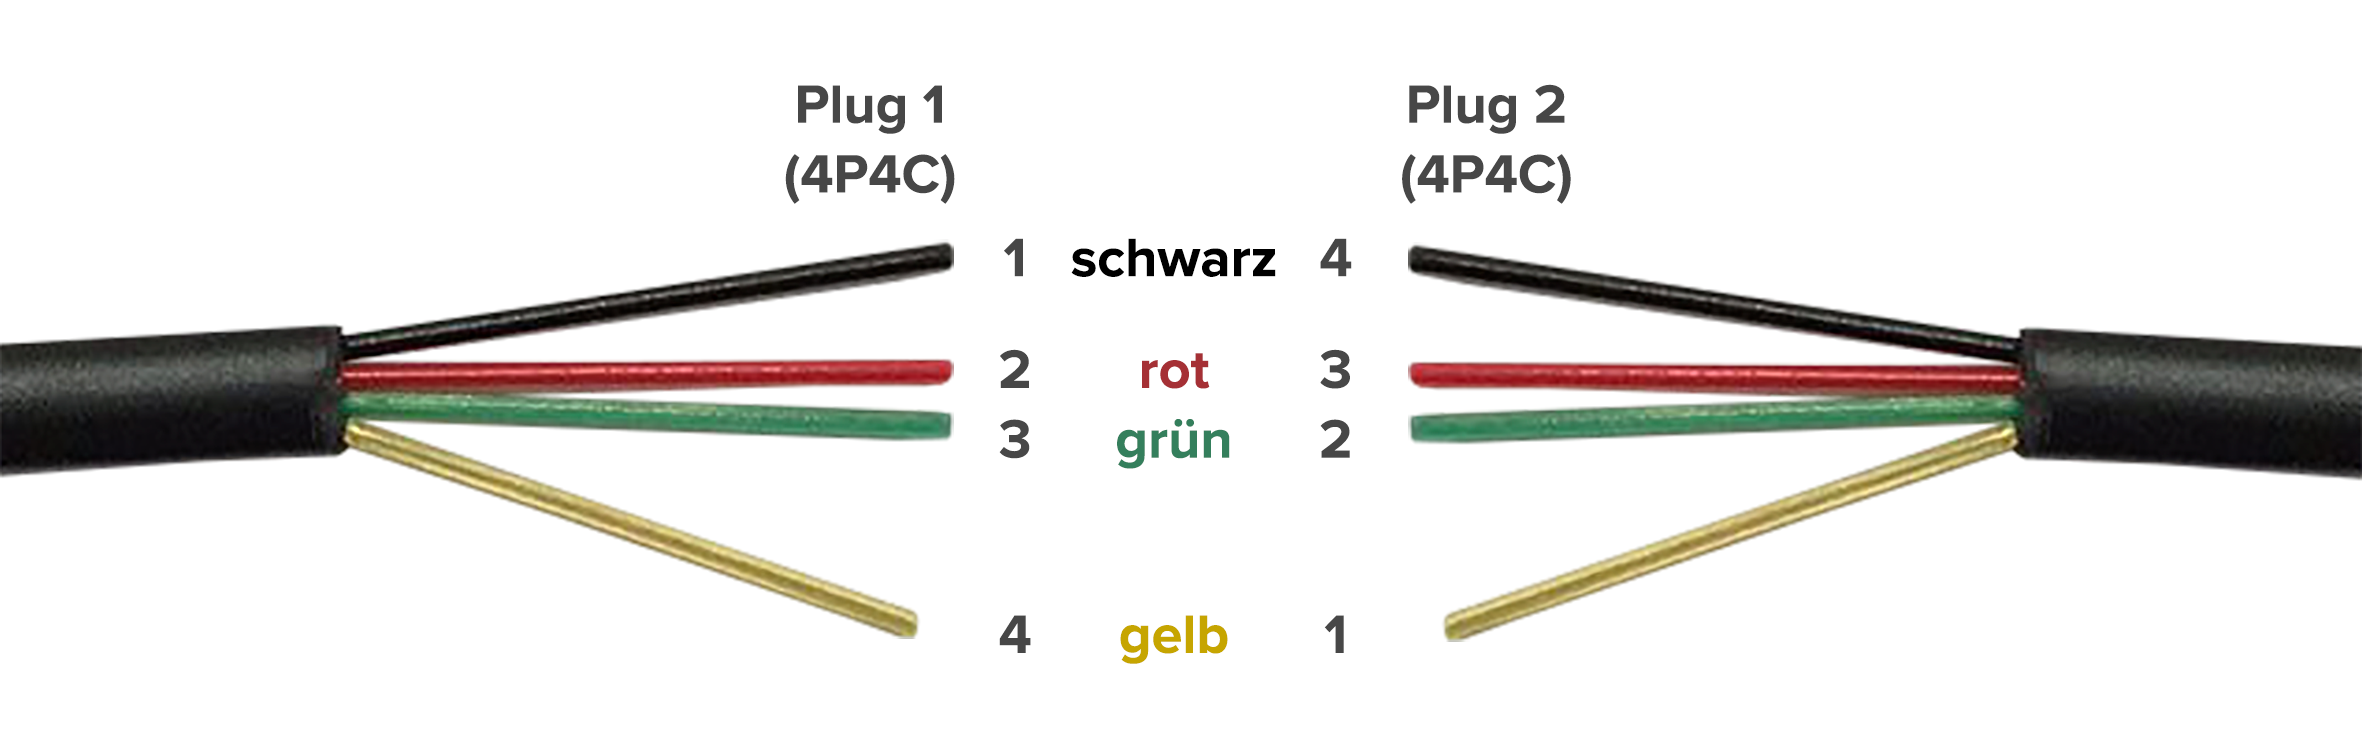 Telefonhörer-Spiralkabel McPower, RJ10-Stecker (4P4C) > RJ10-Stecker (4P4C), 2m